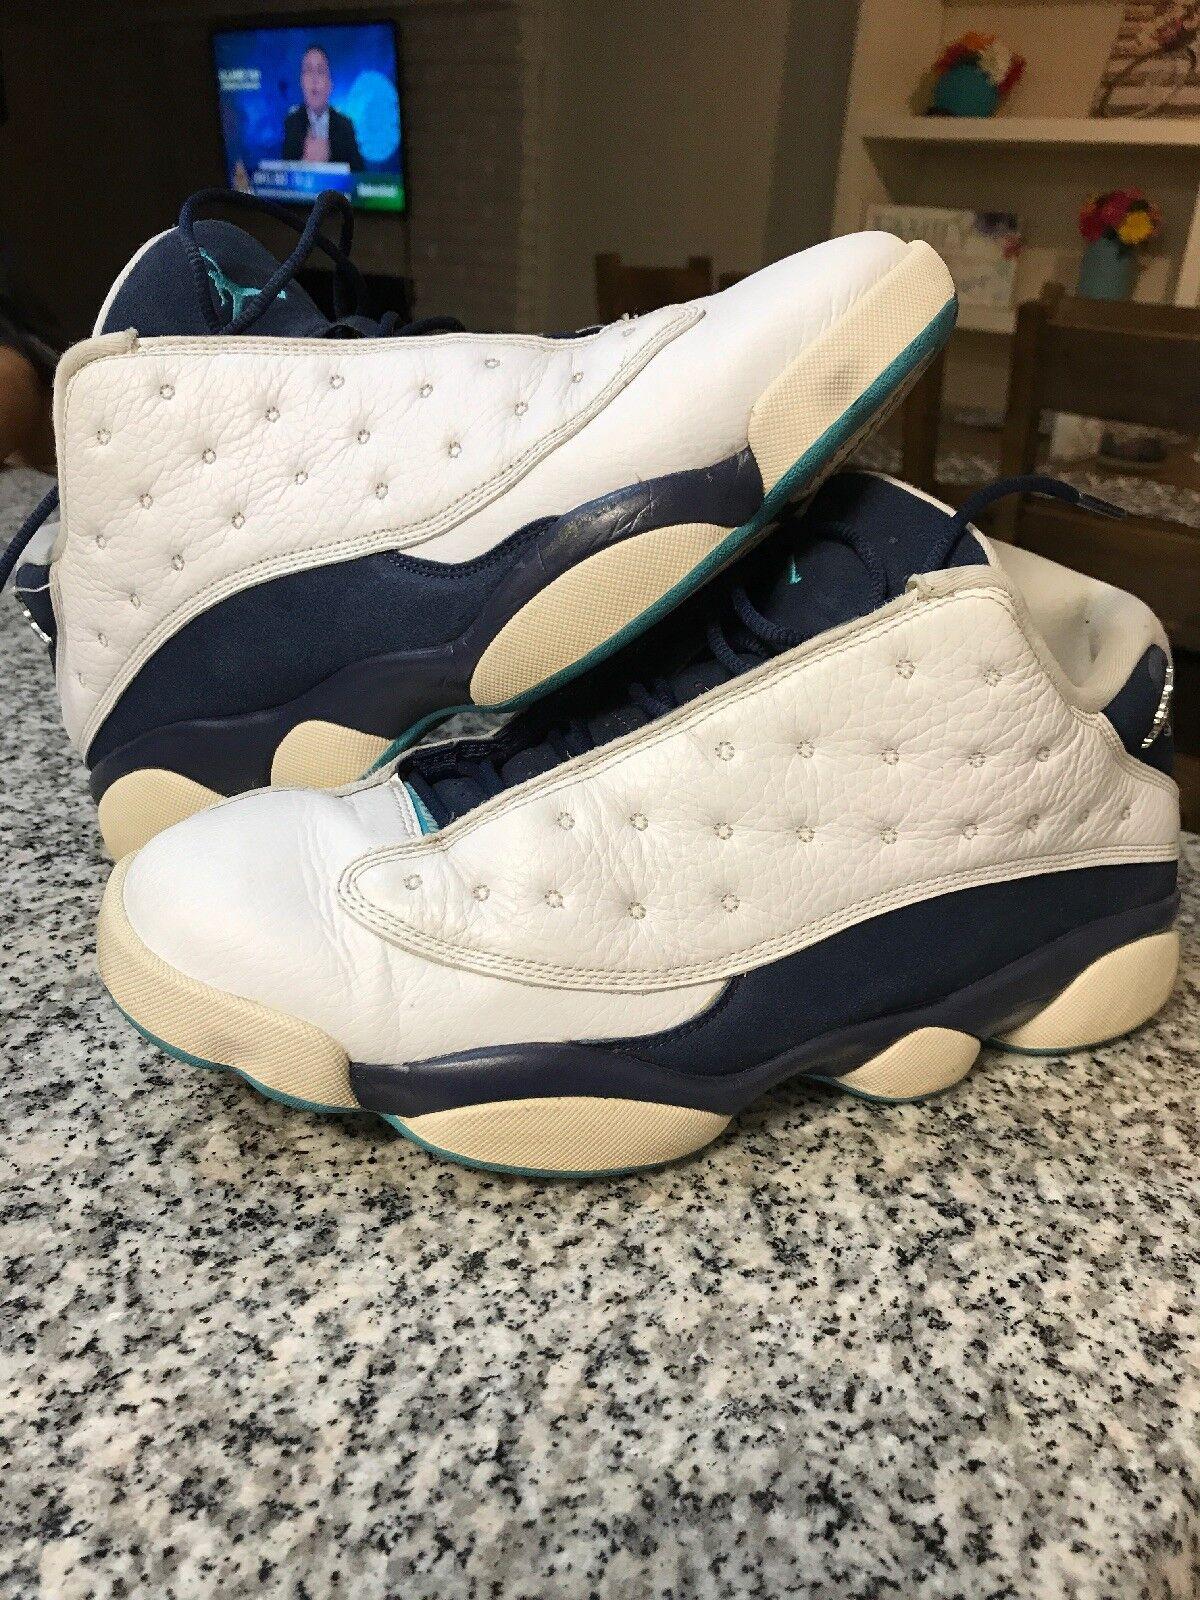 Nike air jordan 13 retro - niedrige hornissen weiß - silber - größe 10,5 (310810-107)